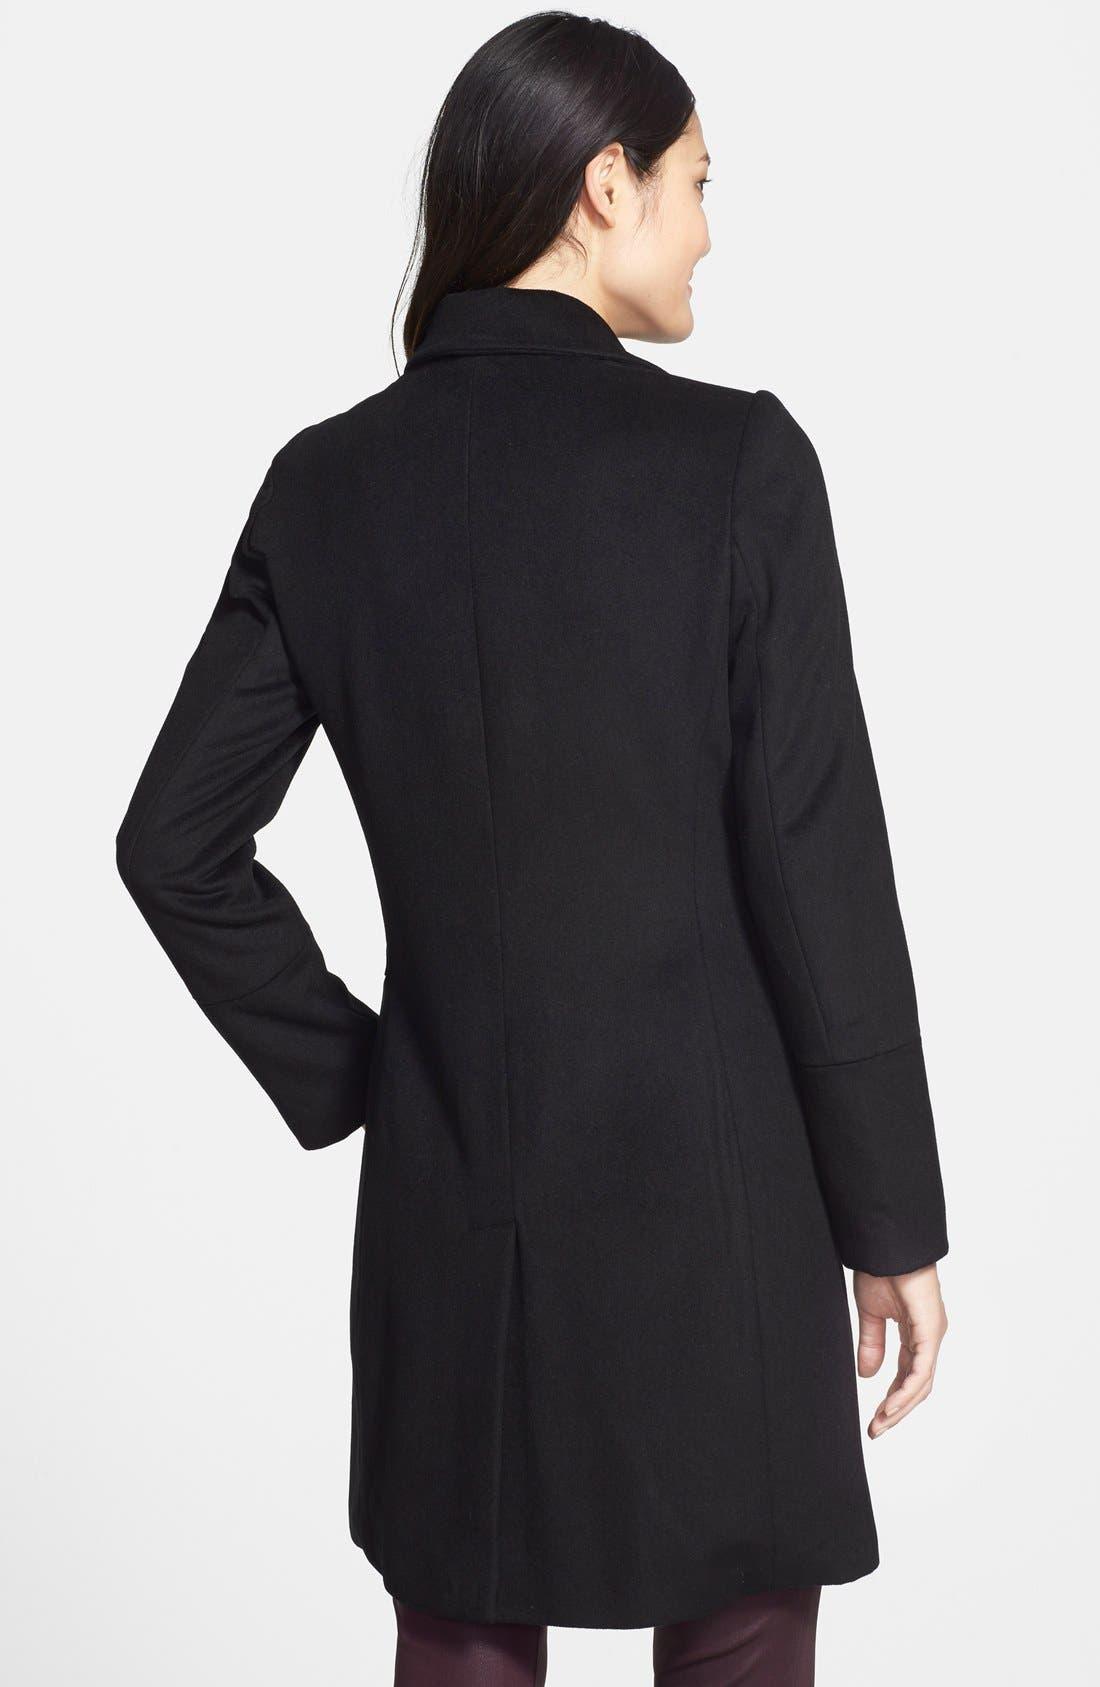 CALVIN KLEIN,                             Notch Collar Wool Blend Coat,                             Alternate thumbnail 3, color,                             001